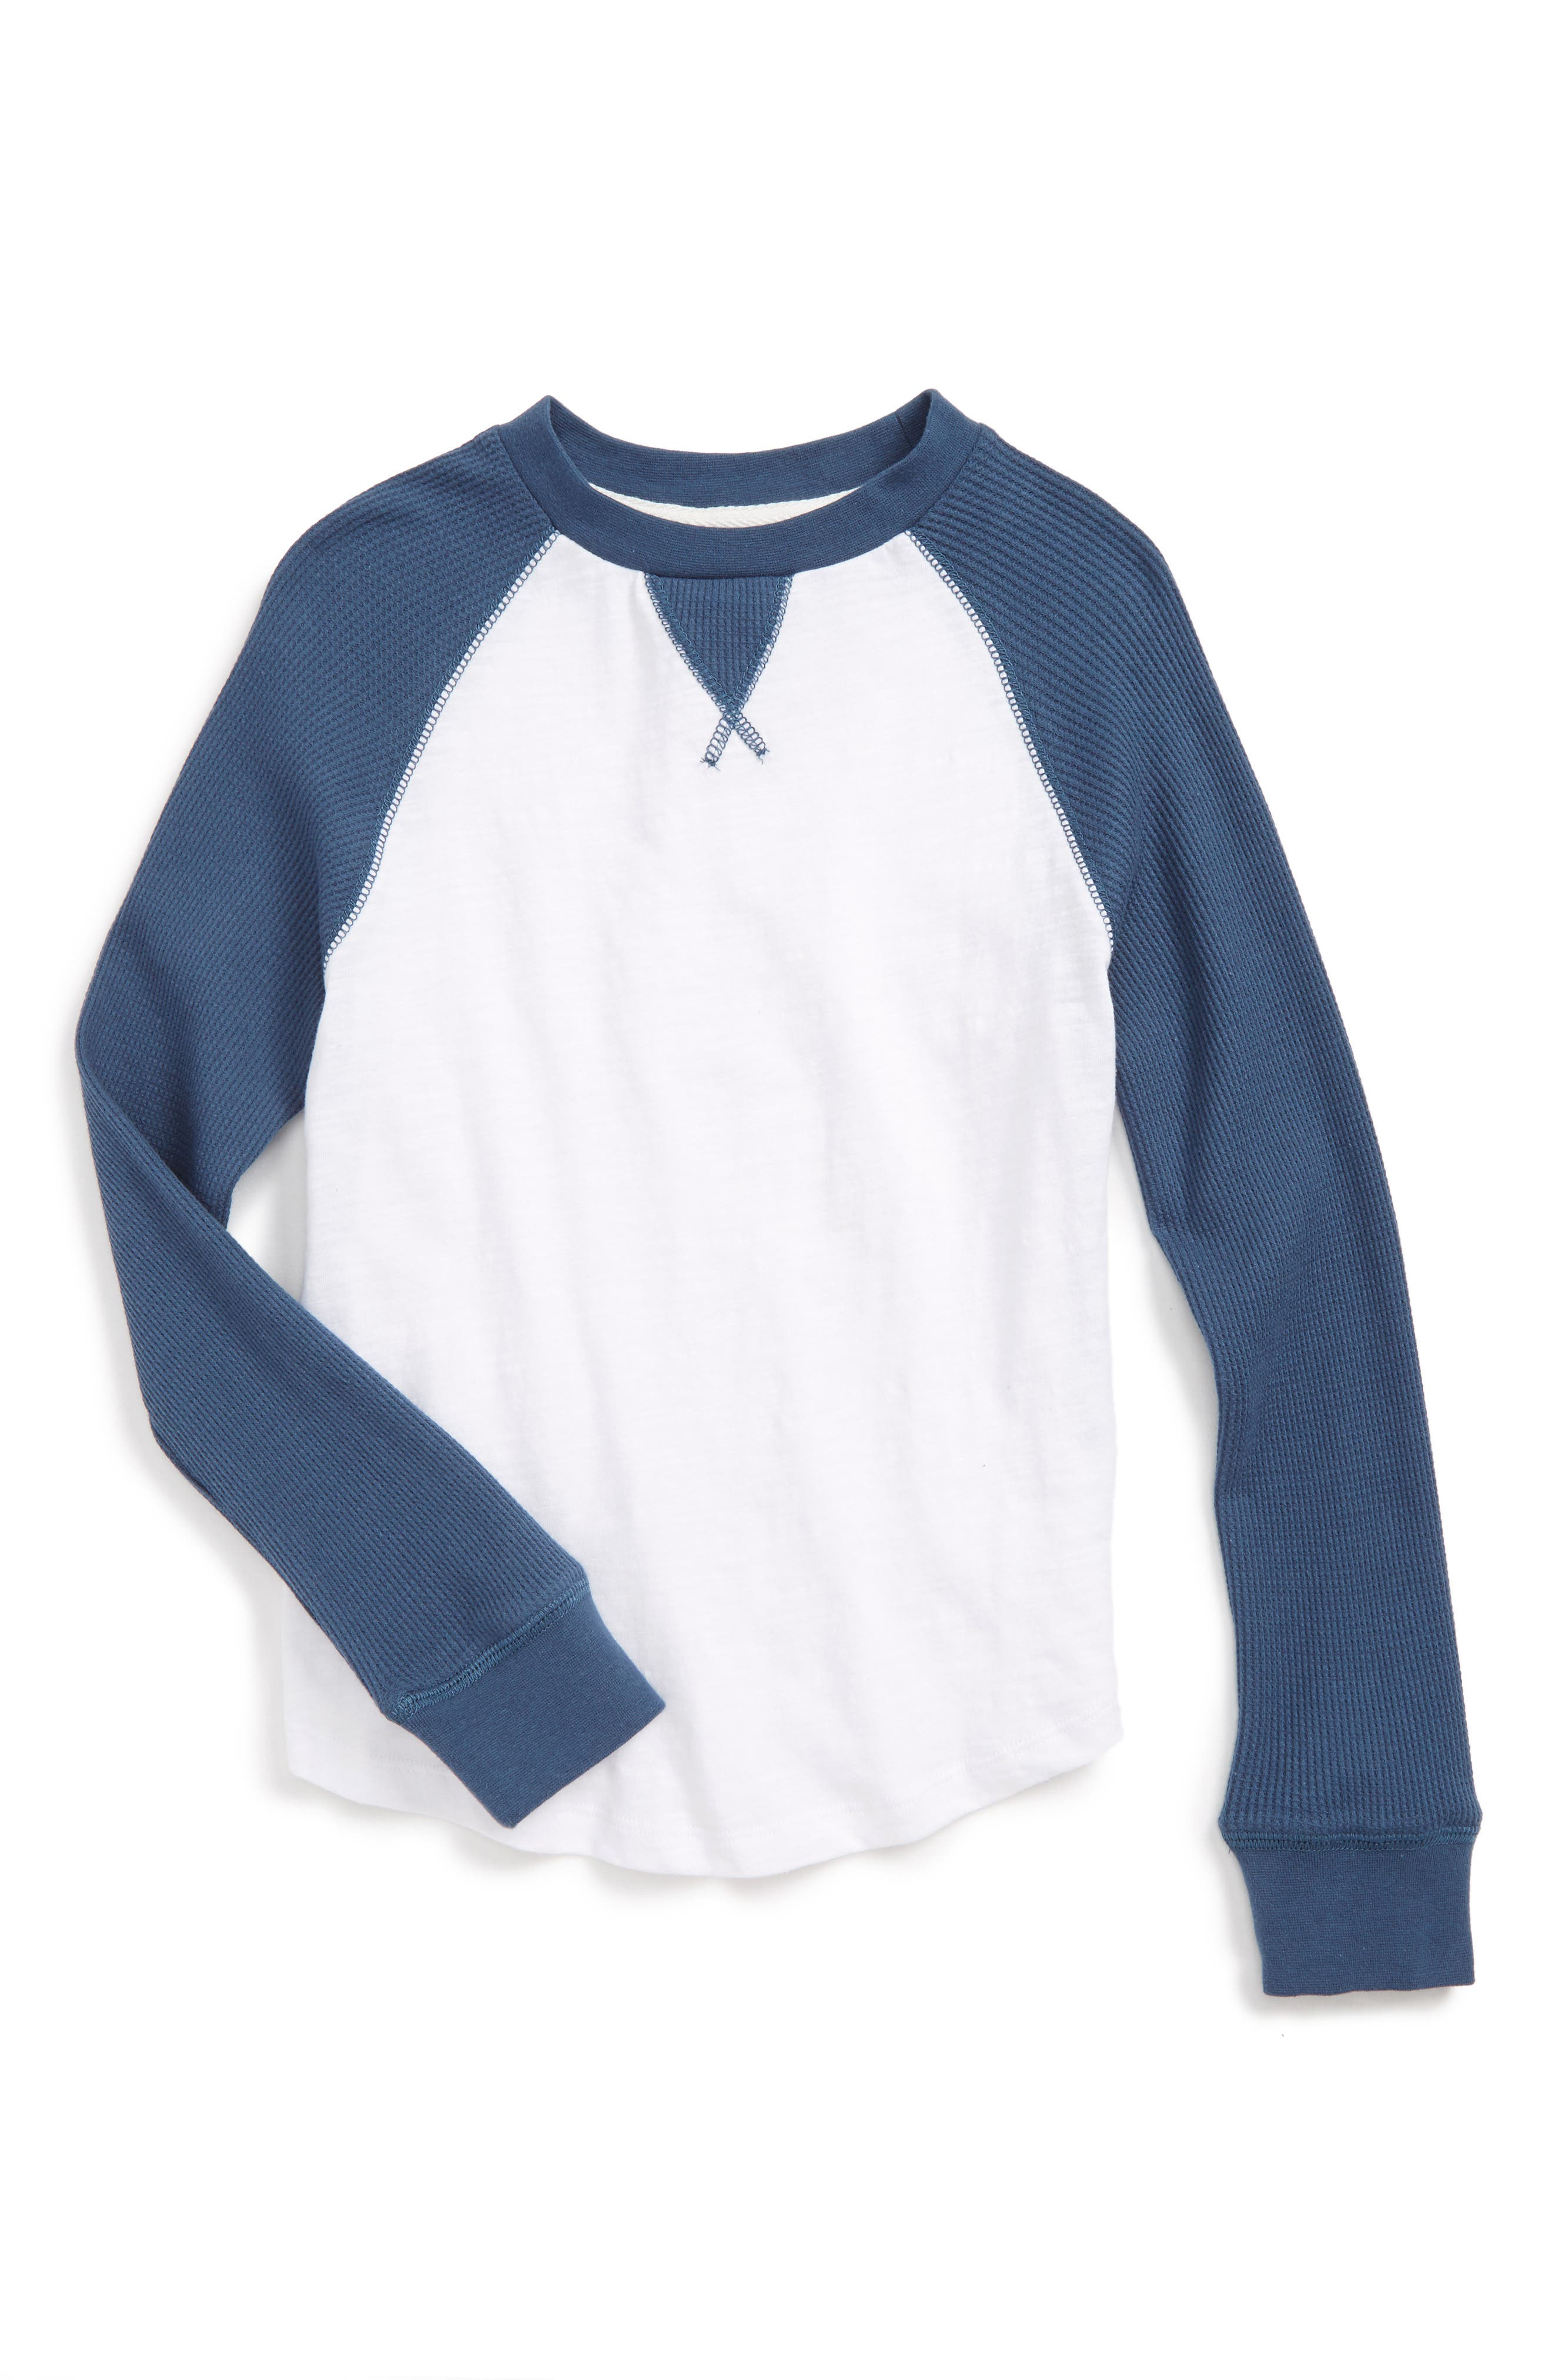 Peek Raglan T-Shirt (Toddler Boys, Little Boys & Big Boys)